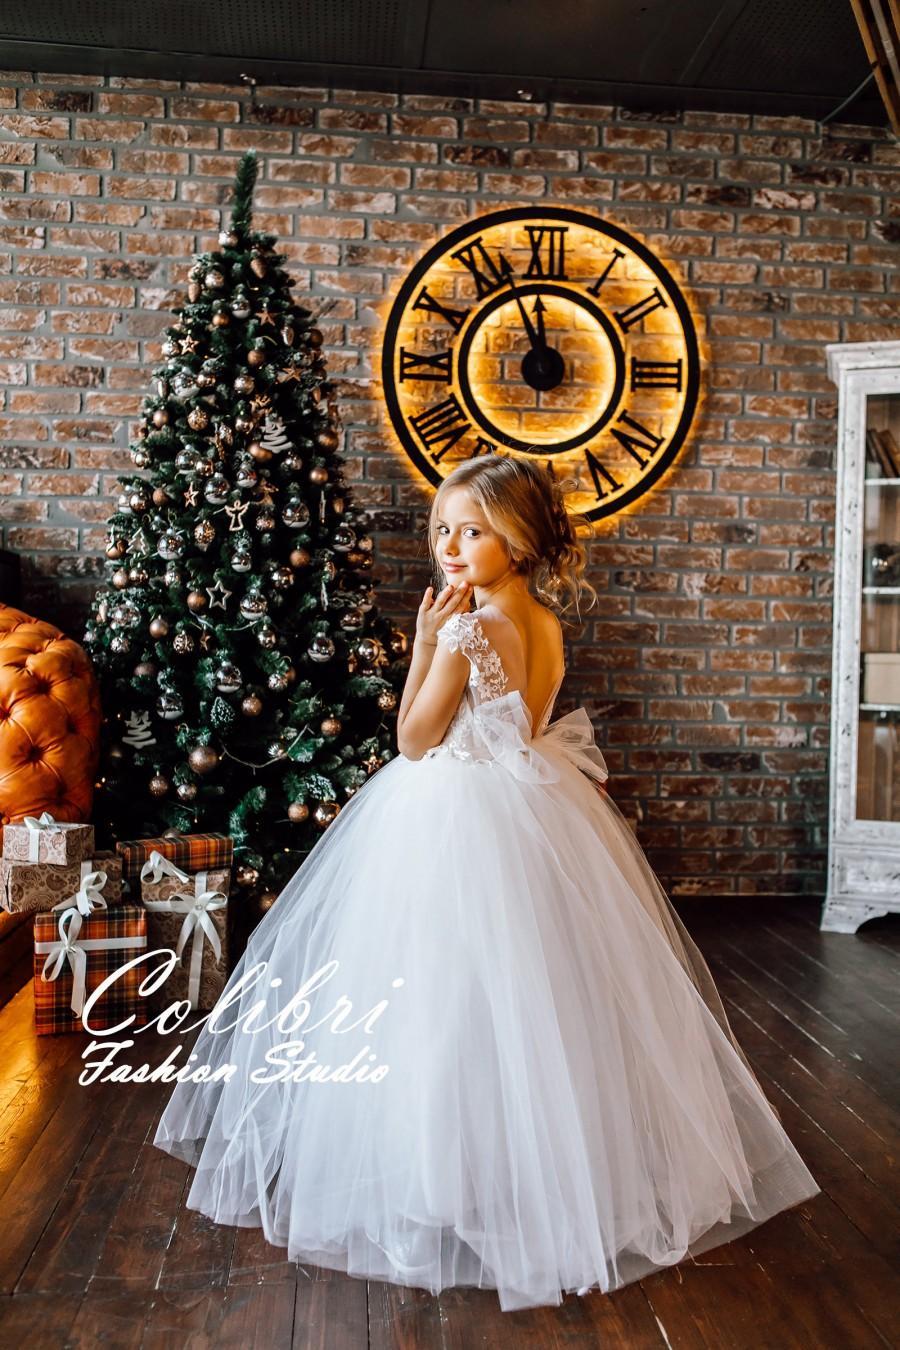 Mariage - Ivory Flower Girl Dress, First Communion Dress, Tutu Flower Girl Dress, Lace Girl Dress, Tulle Girl Dress, White Flower Girl Dress